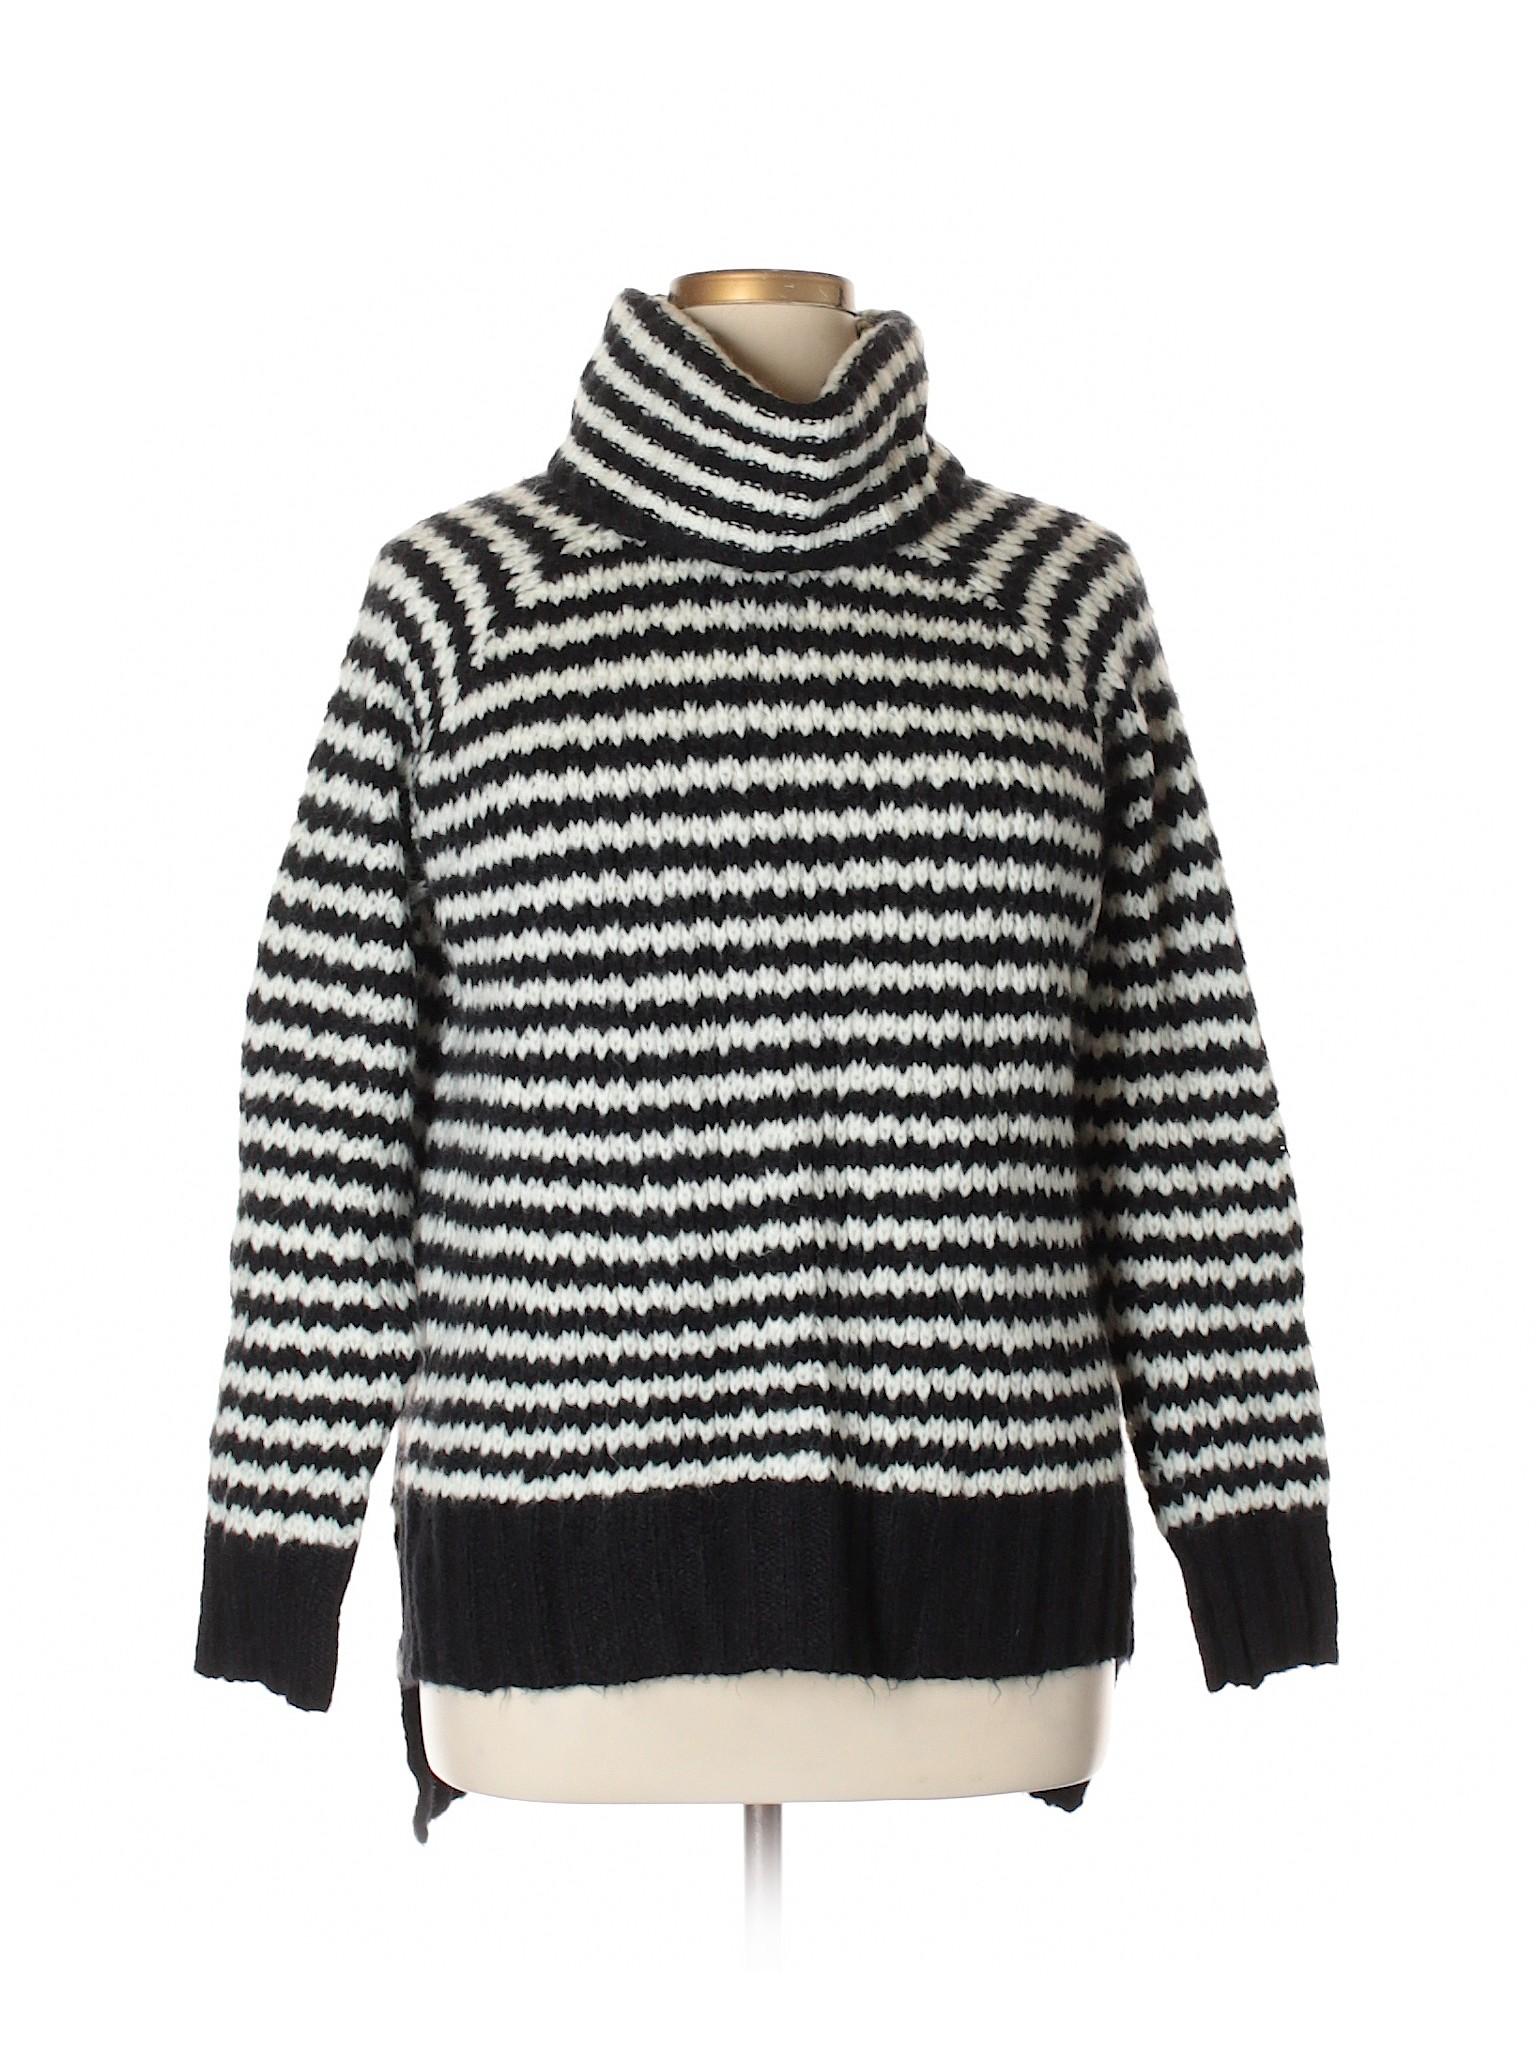 New A Boutique Approach n a a Sweater Turtleneck wqtXIUtr